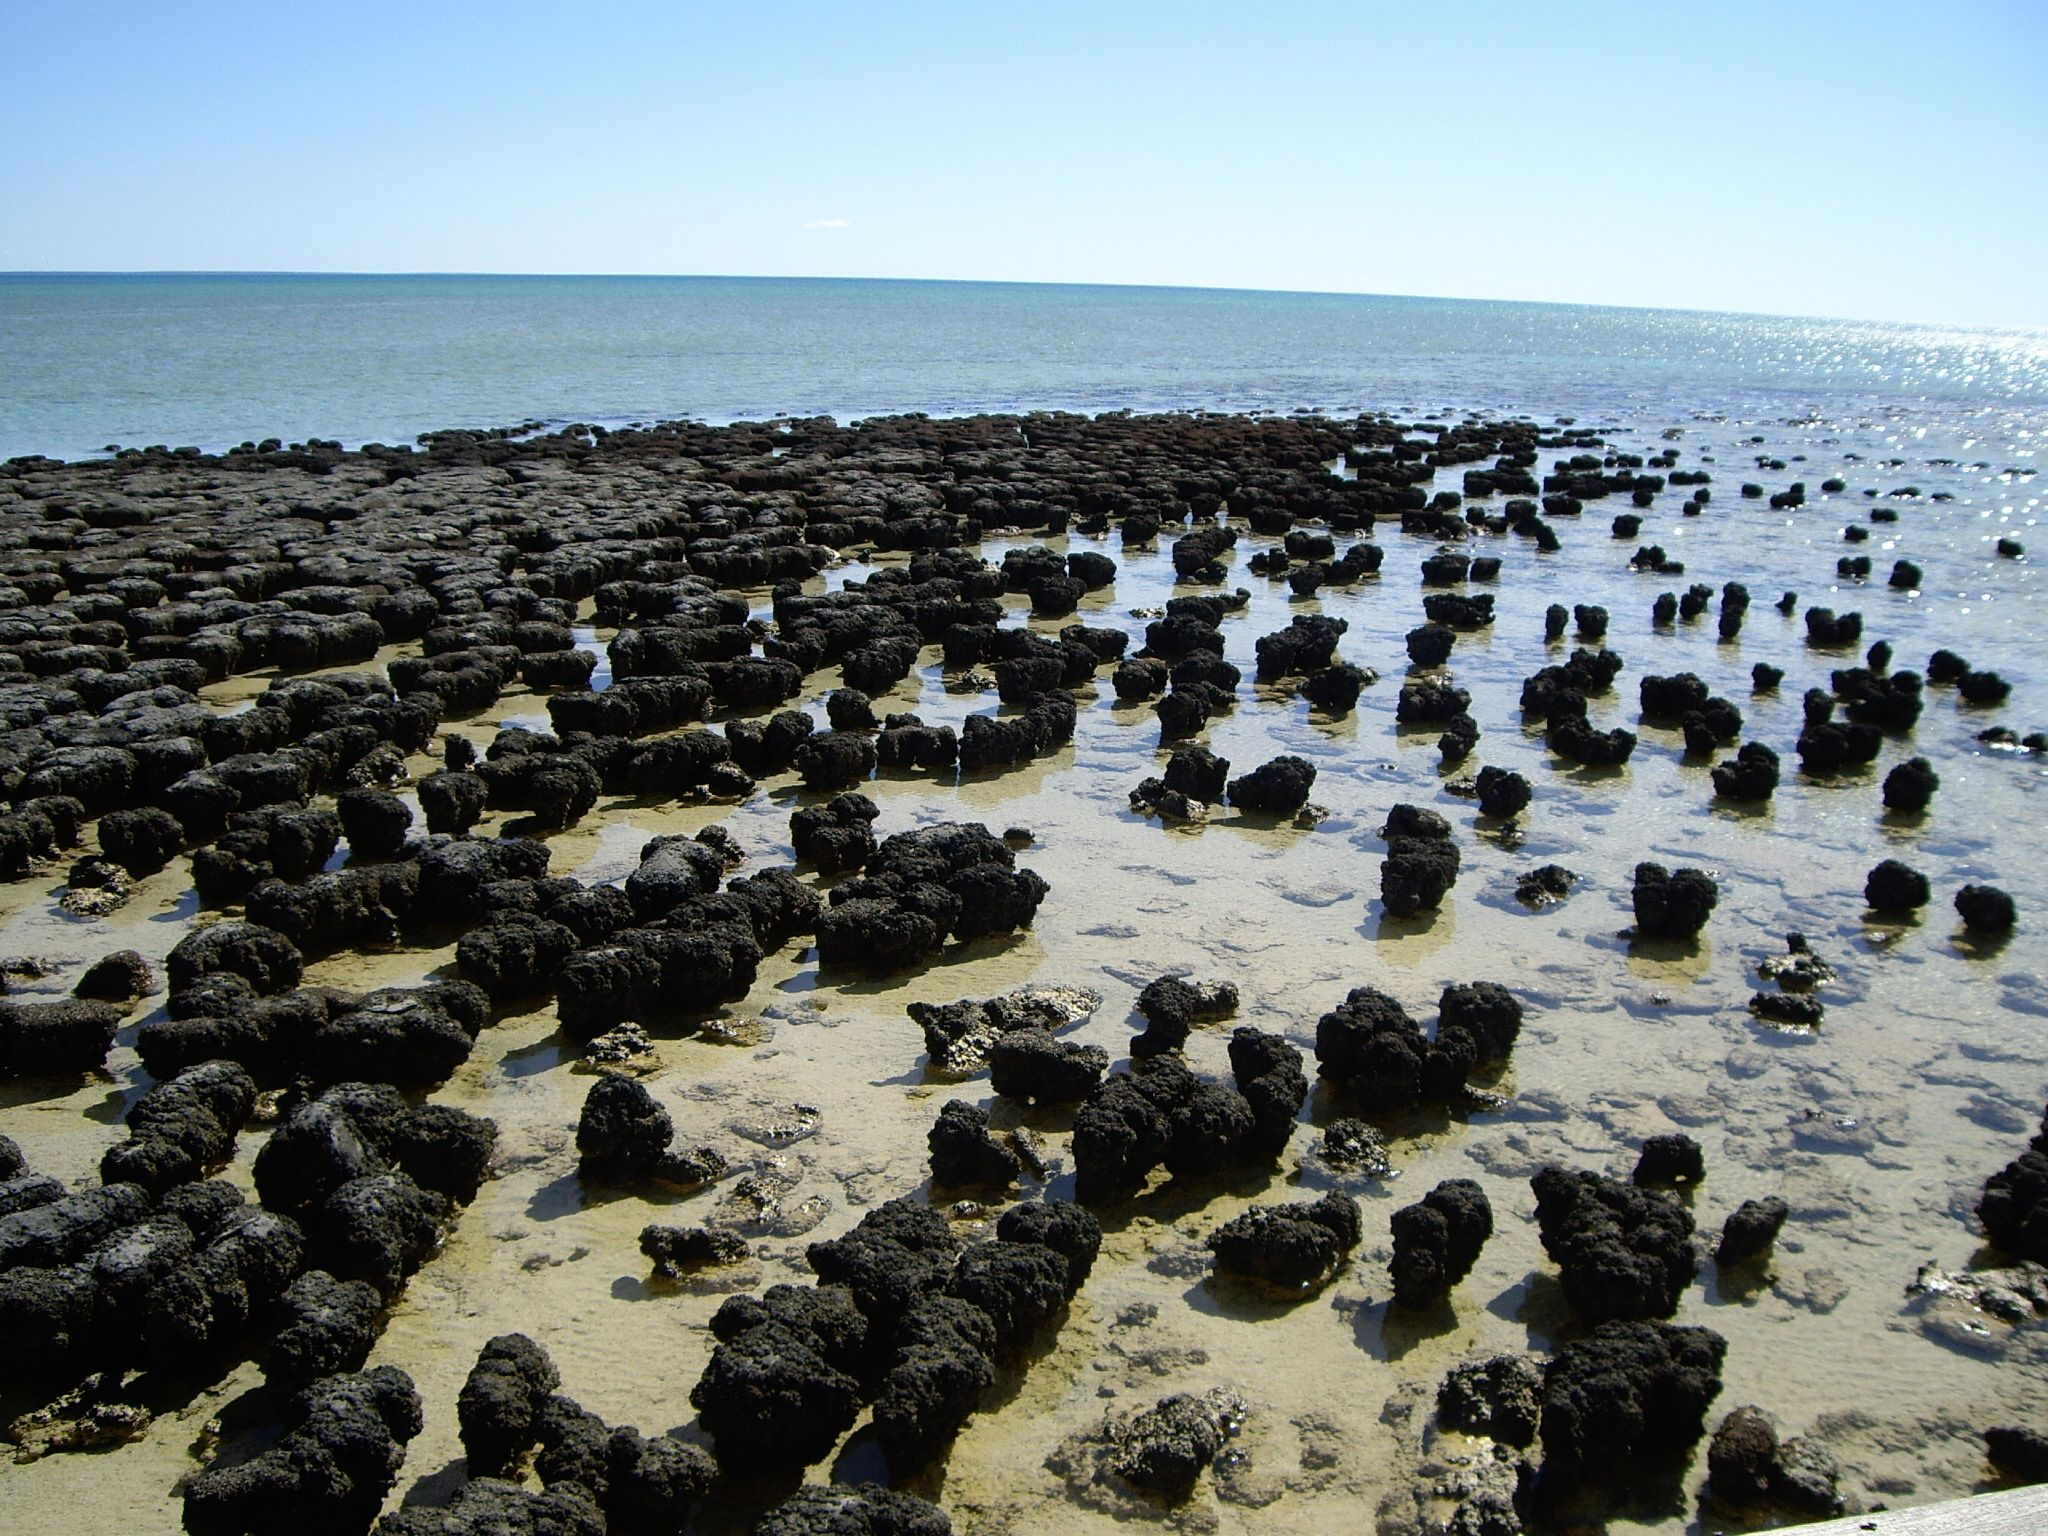 Shark Bay Stromatolites File:stromatolites in Shark